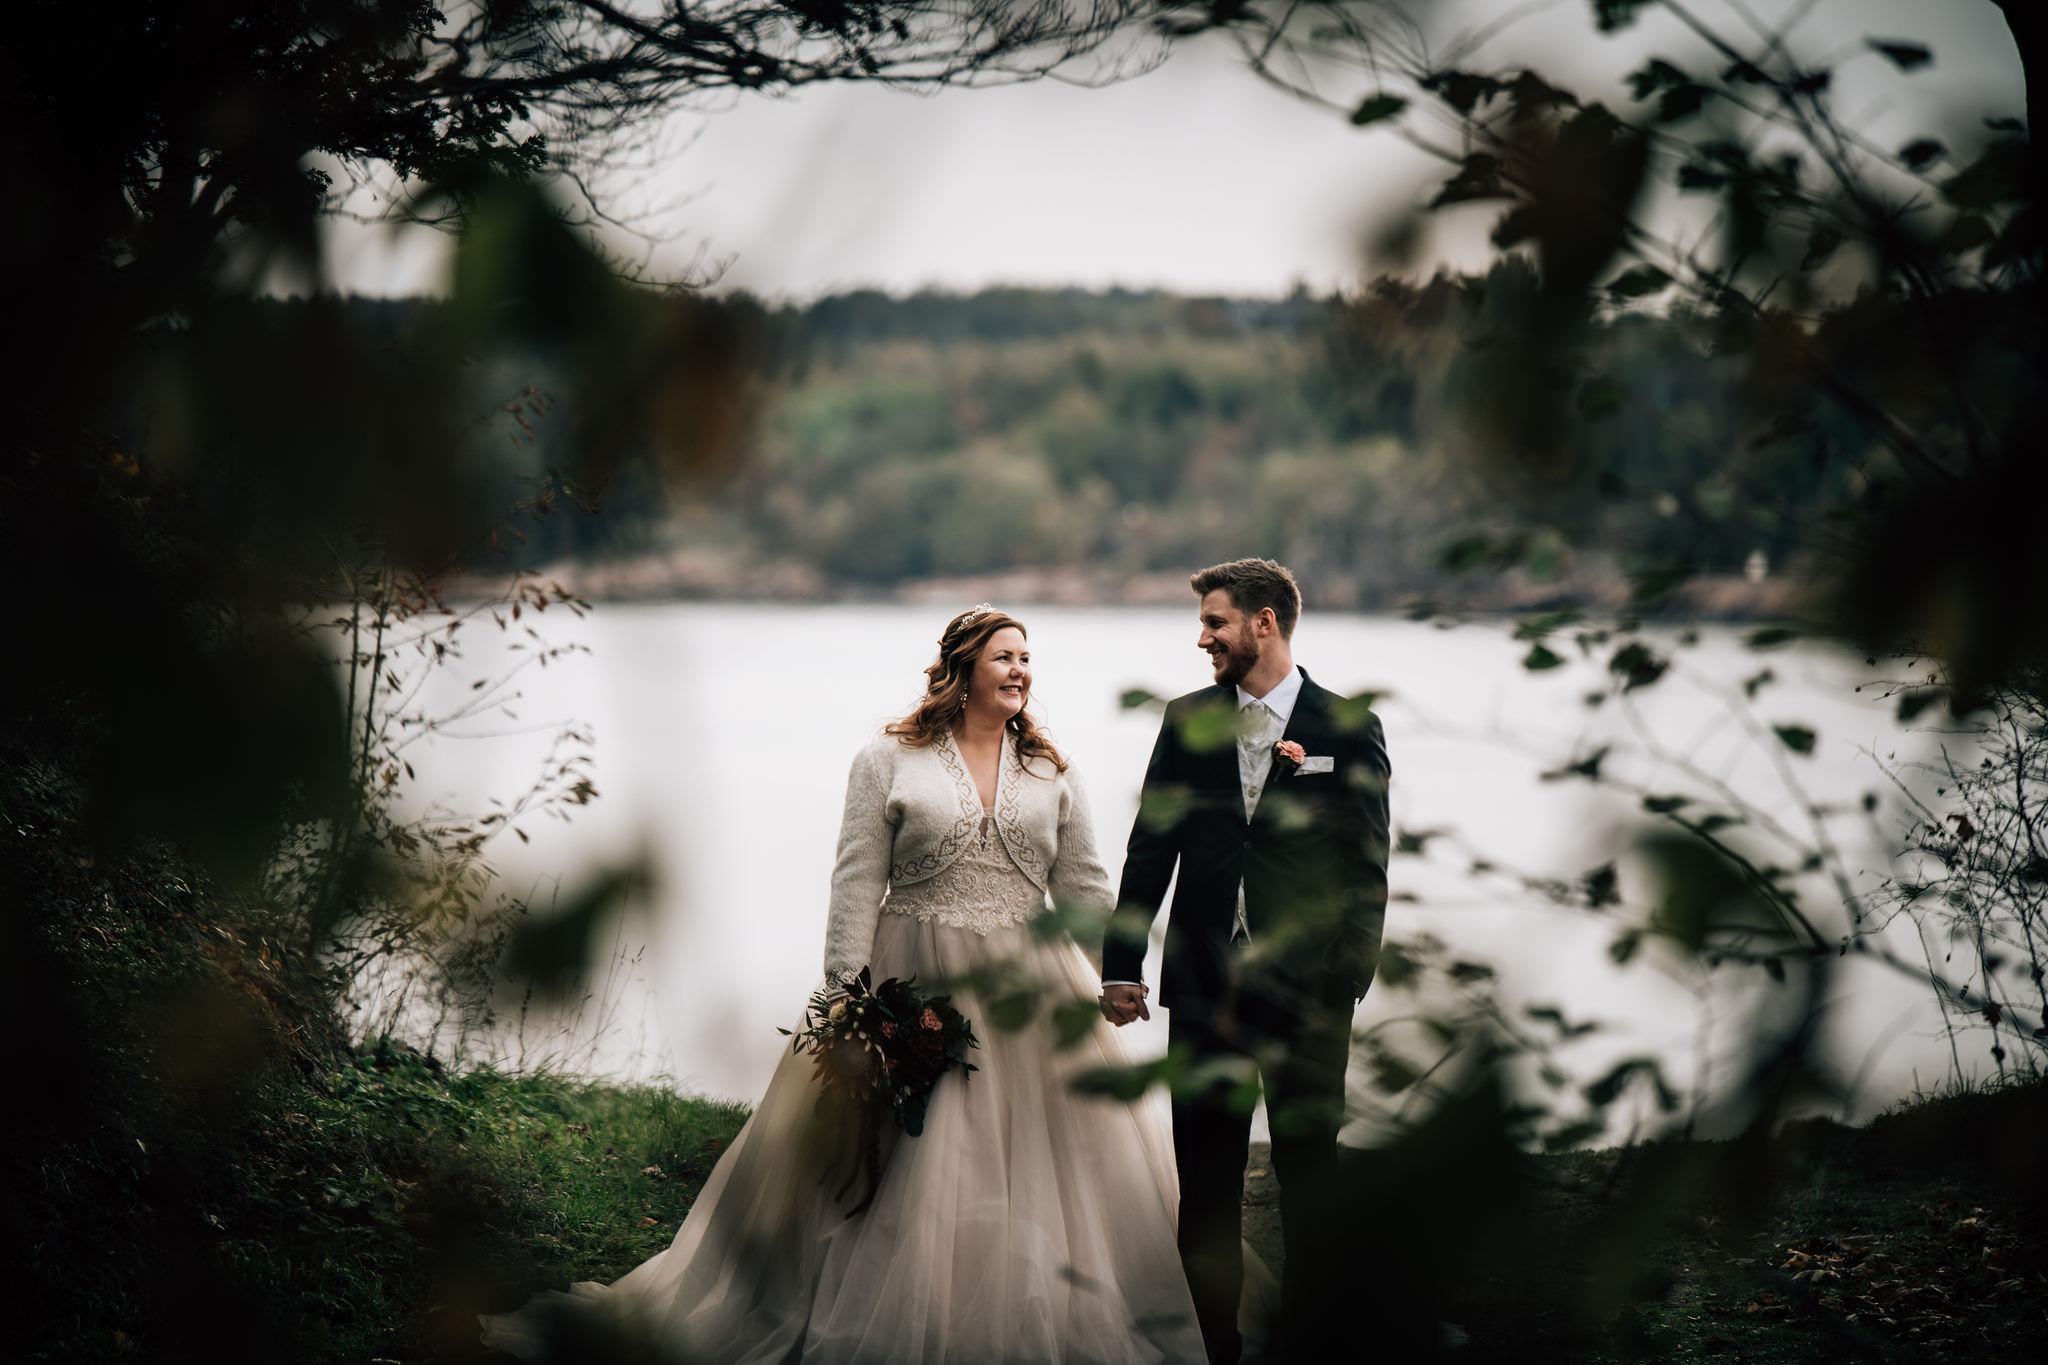 _N857942_fotografering_larvik_bryllup_aspargesgarden_.jpg